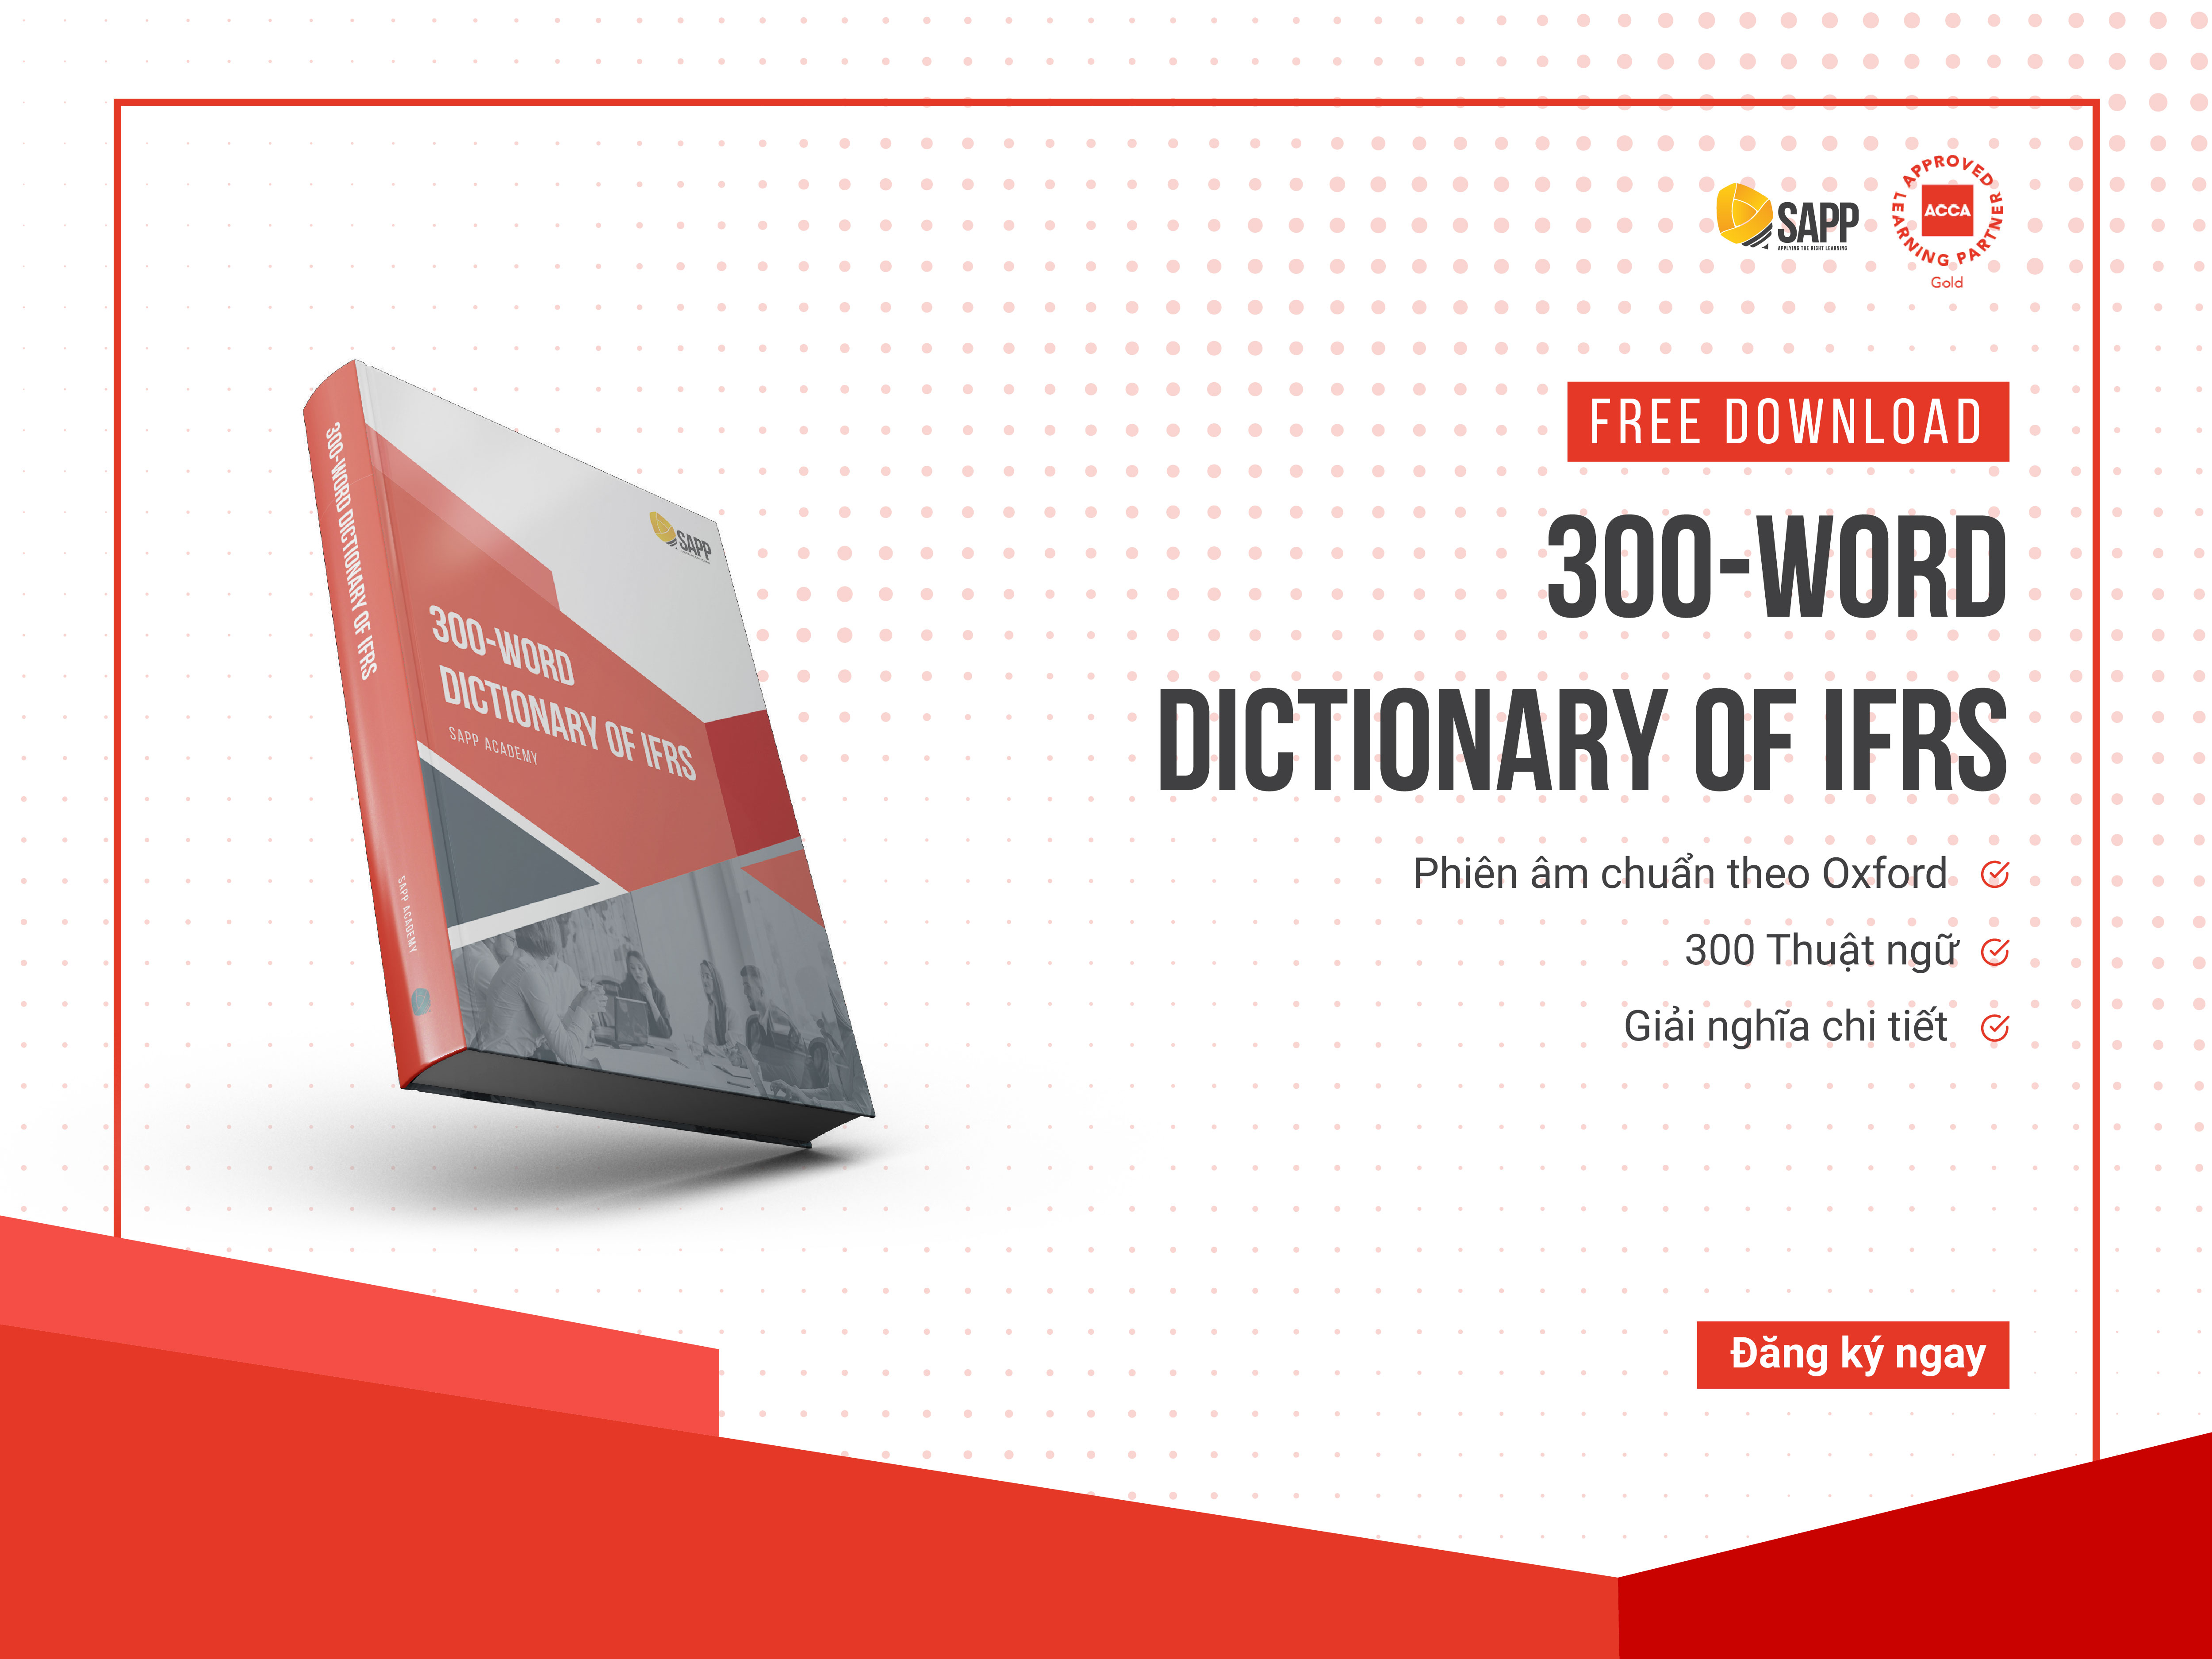 Freedowload từ điển IFRS